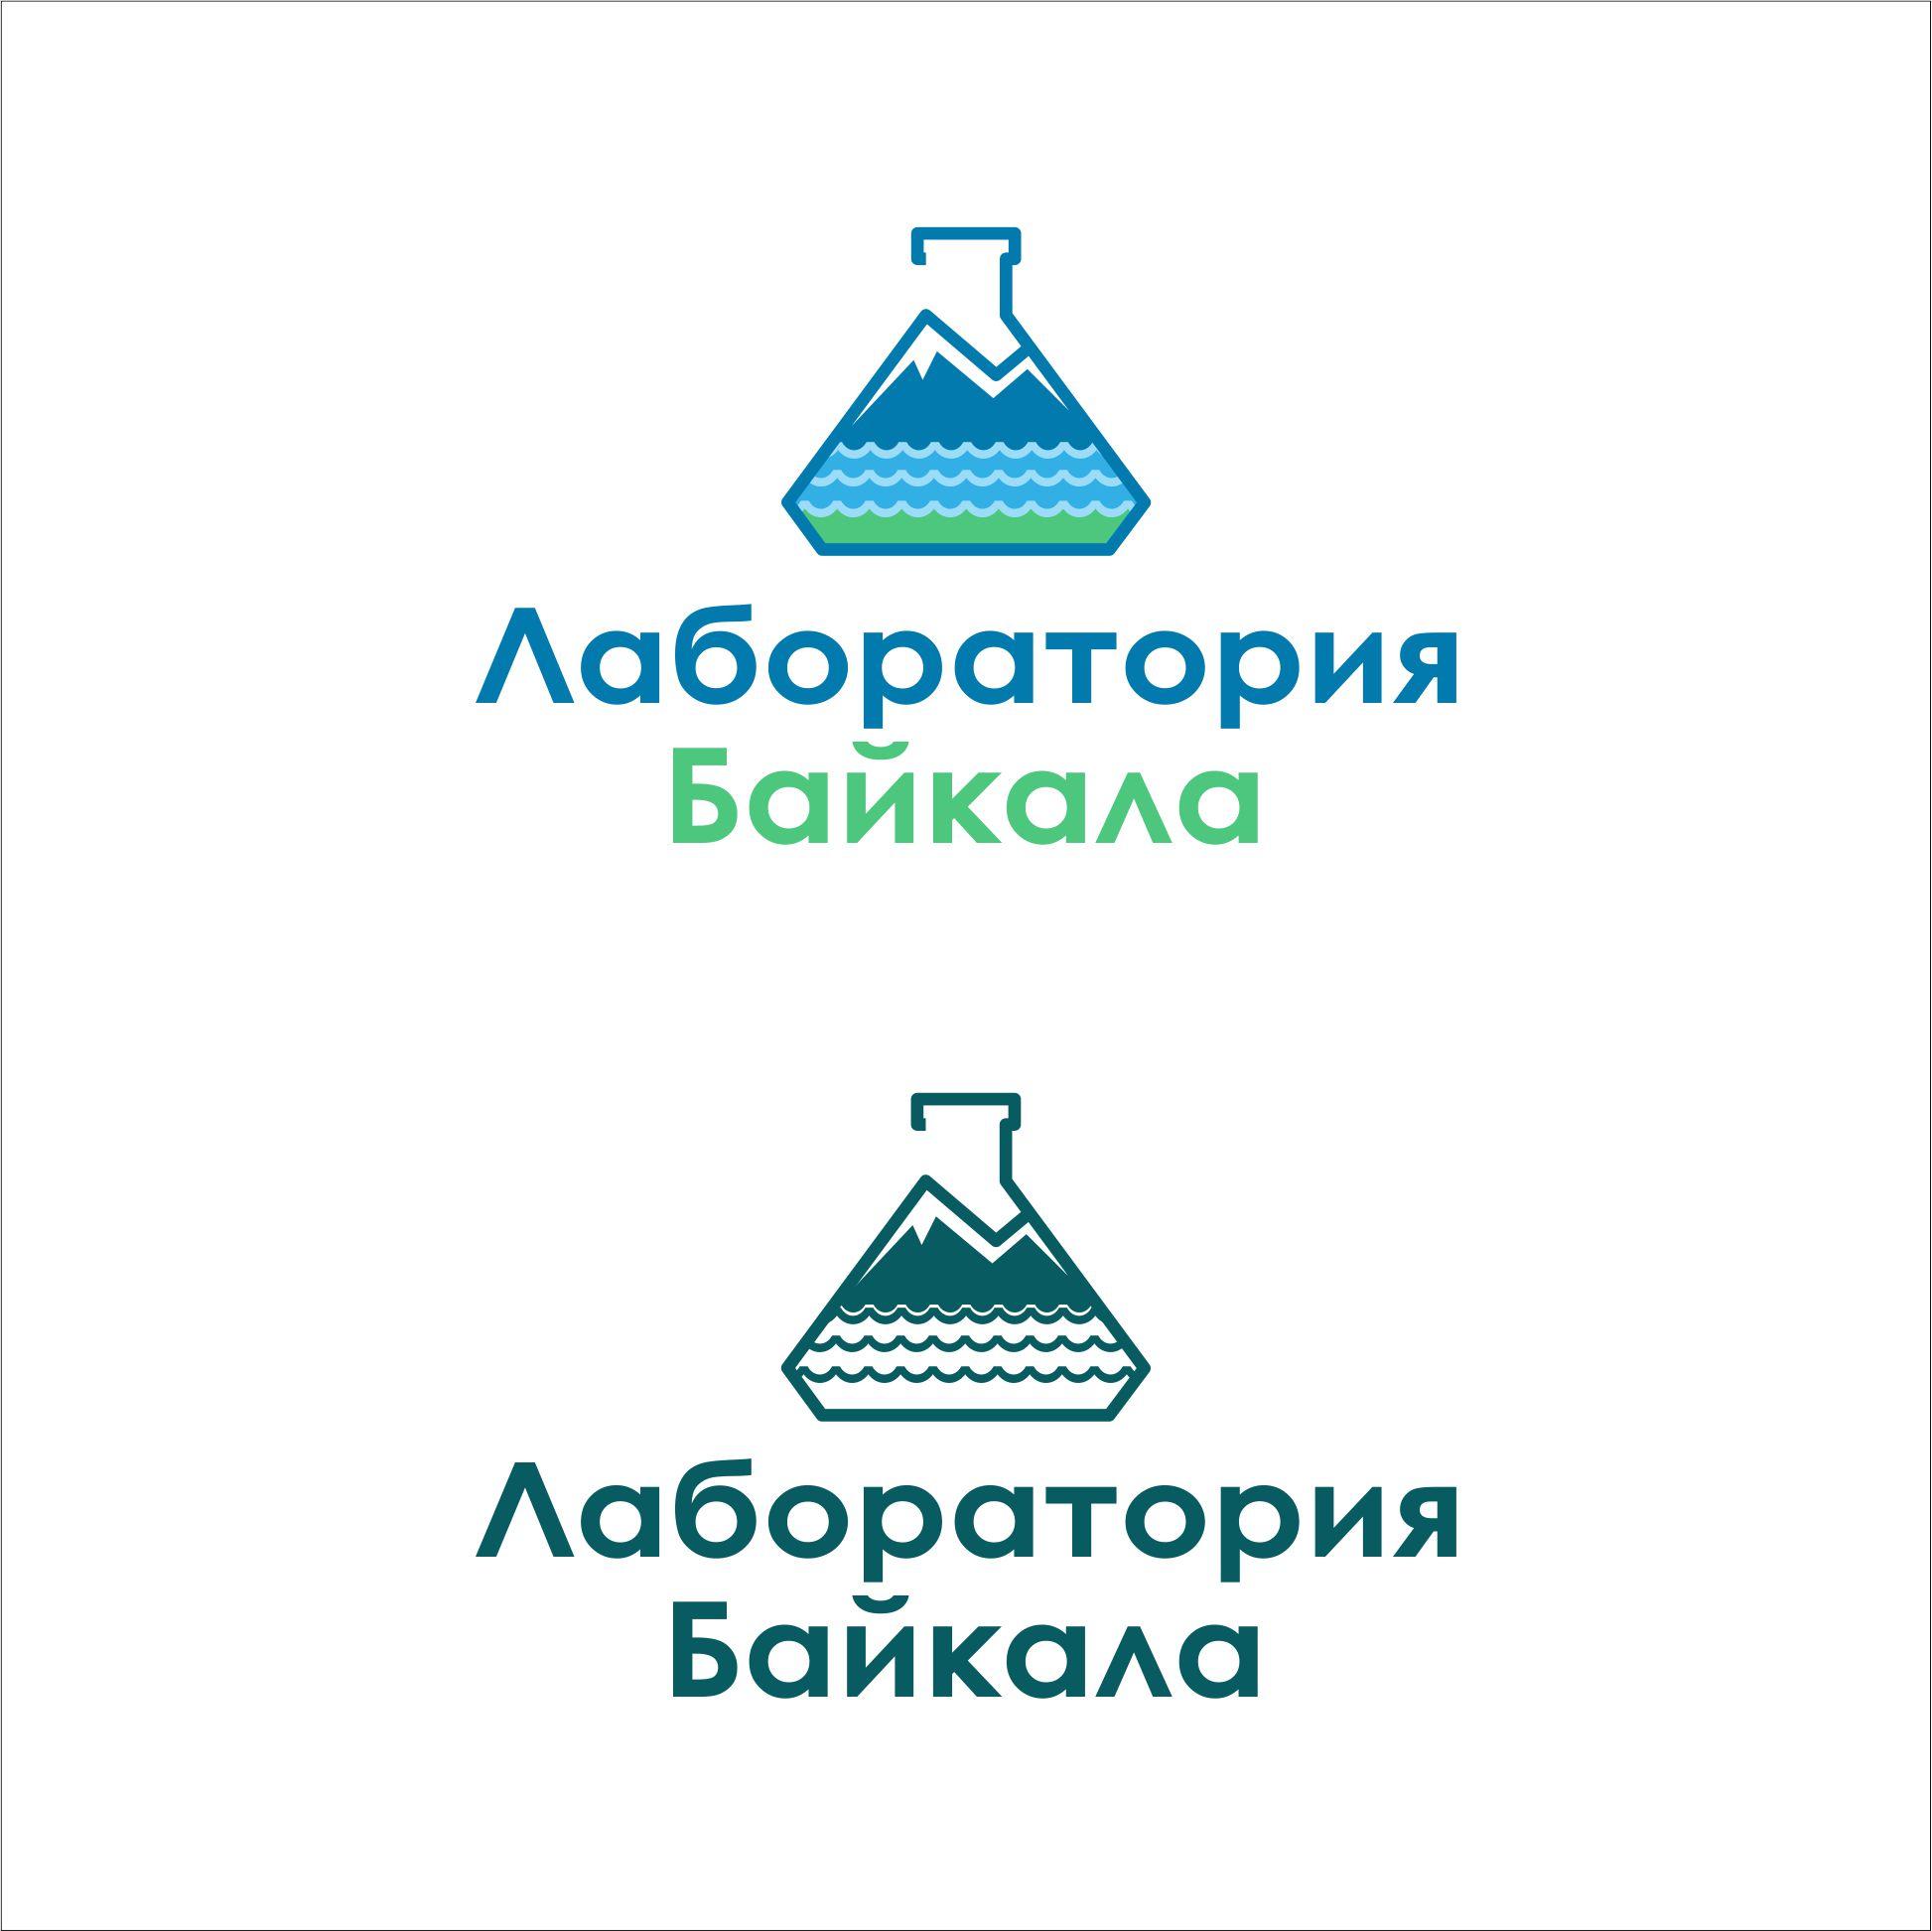 Разработка логотипа торговой марки фото f_2385969b4c179218.jpg